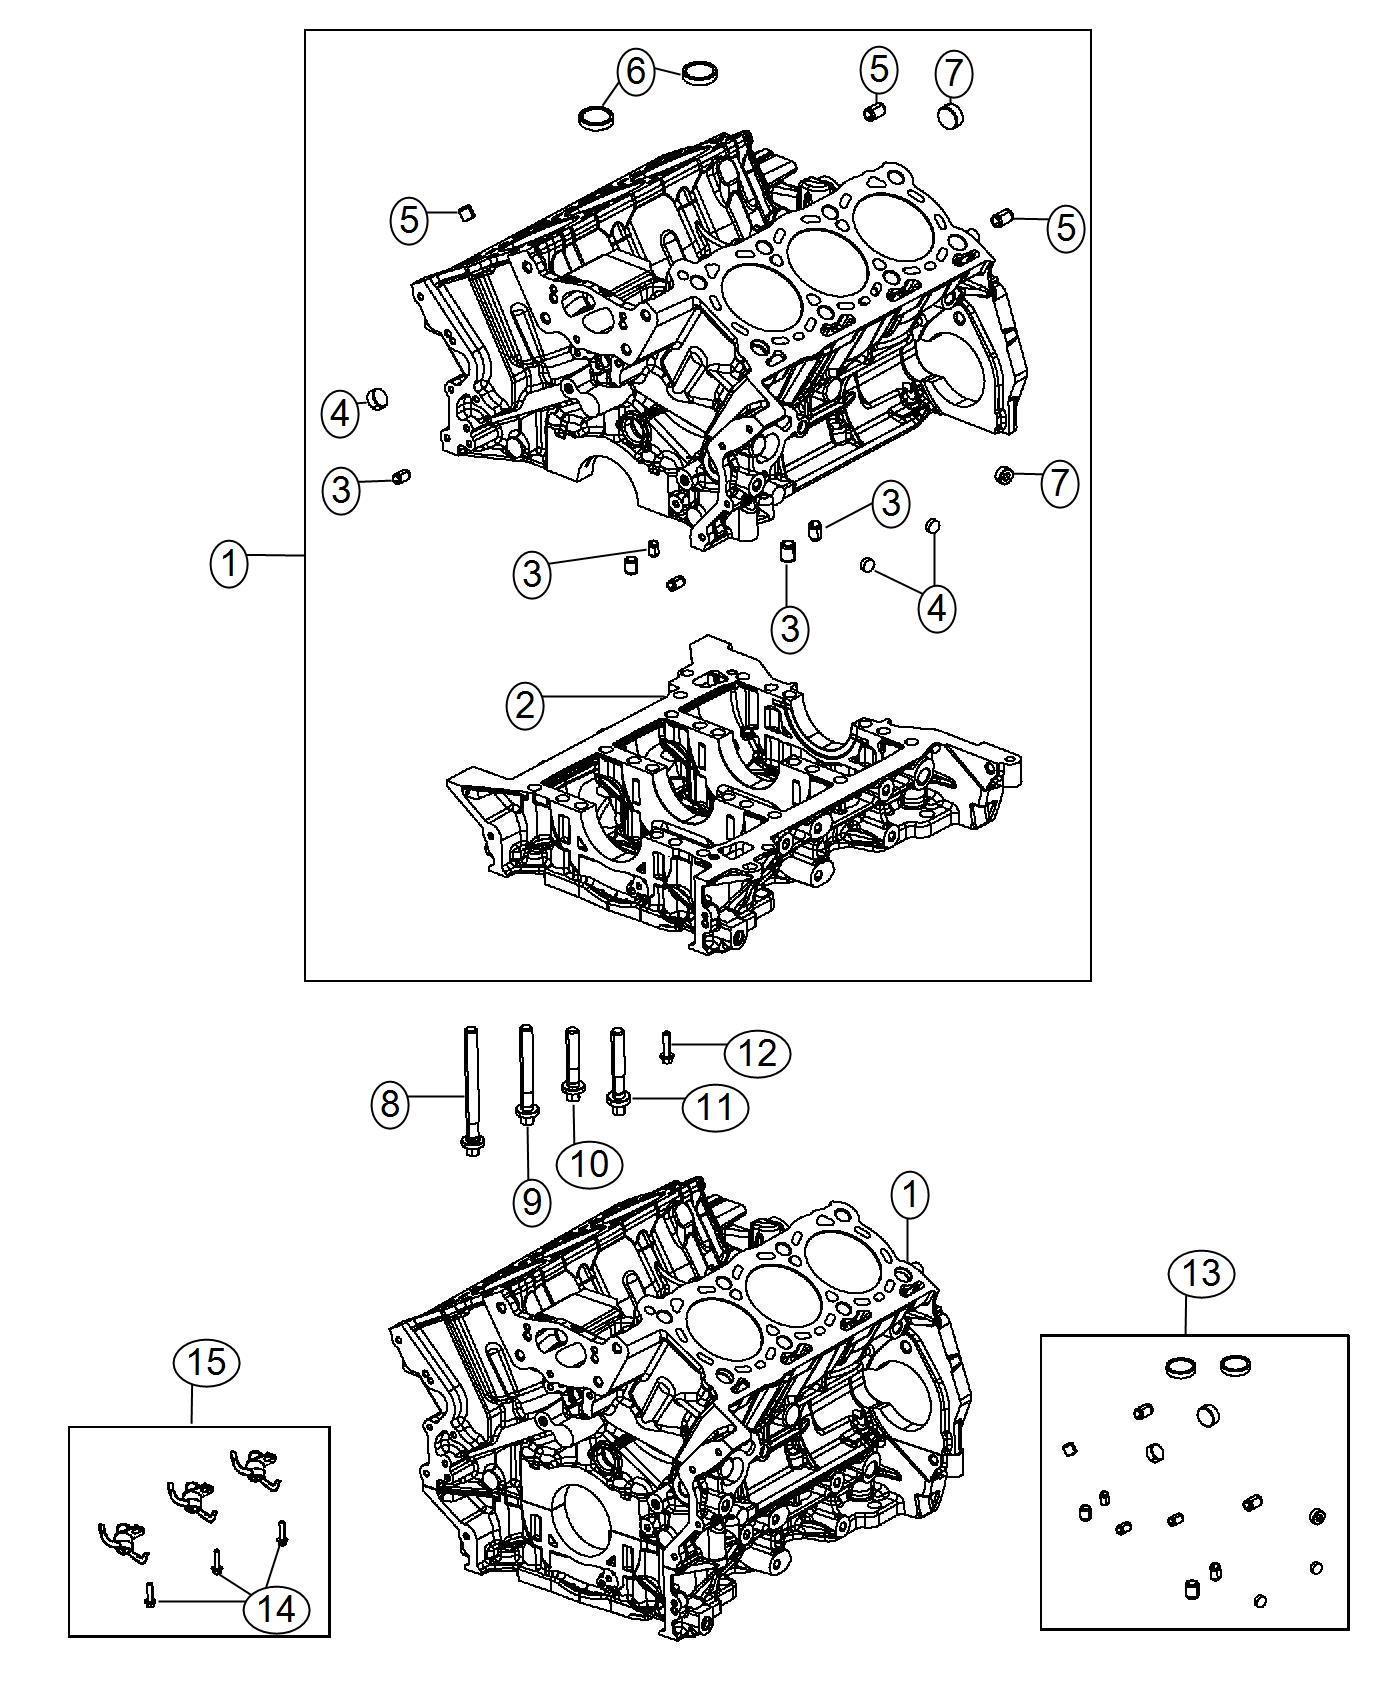 Ram Hardware Kit Cylinder Block Emissions